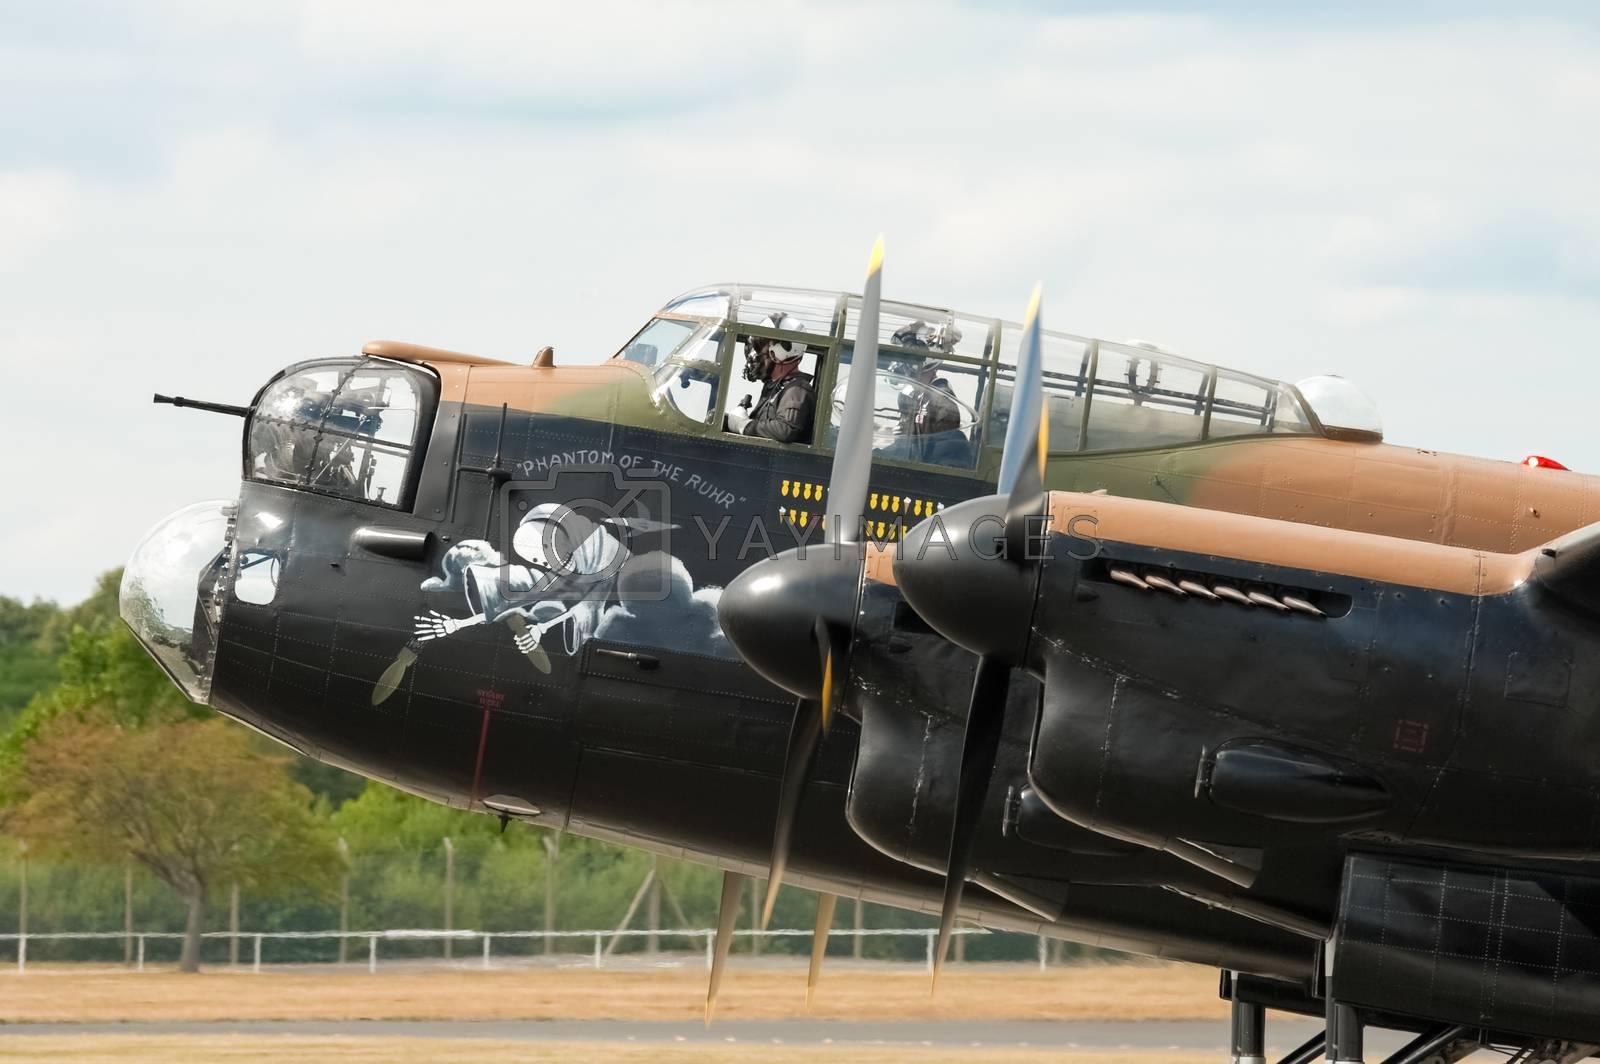 Farnborough, UK - July 24, 2010: Cockpit closeup of the last flying WW2 Lancaster bomber at the Farnborough Airshow, UK